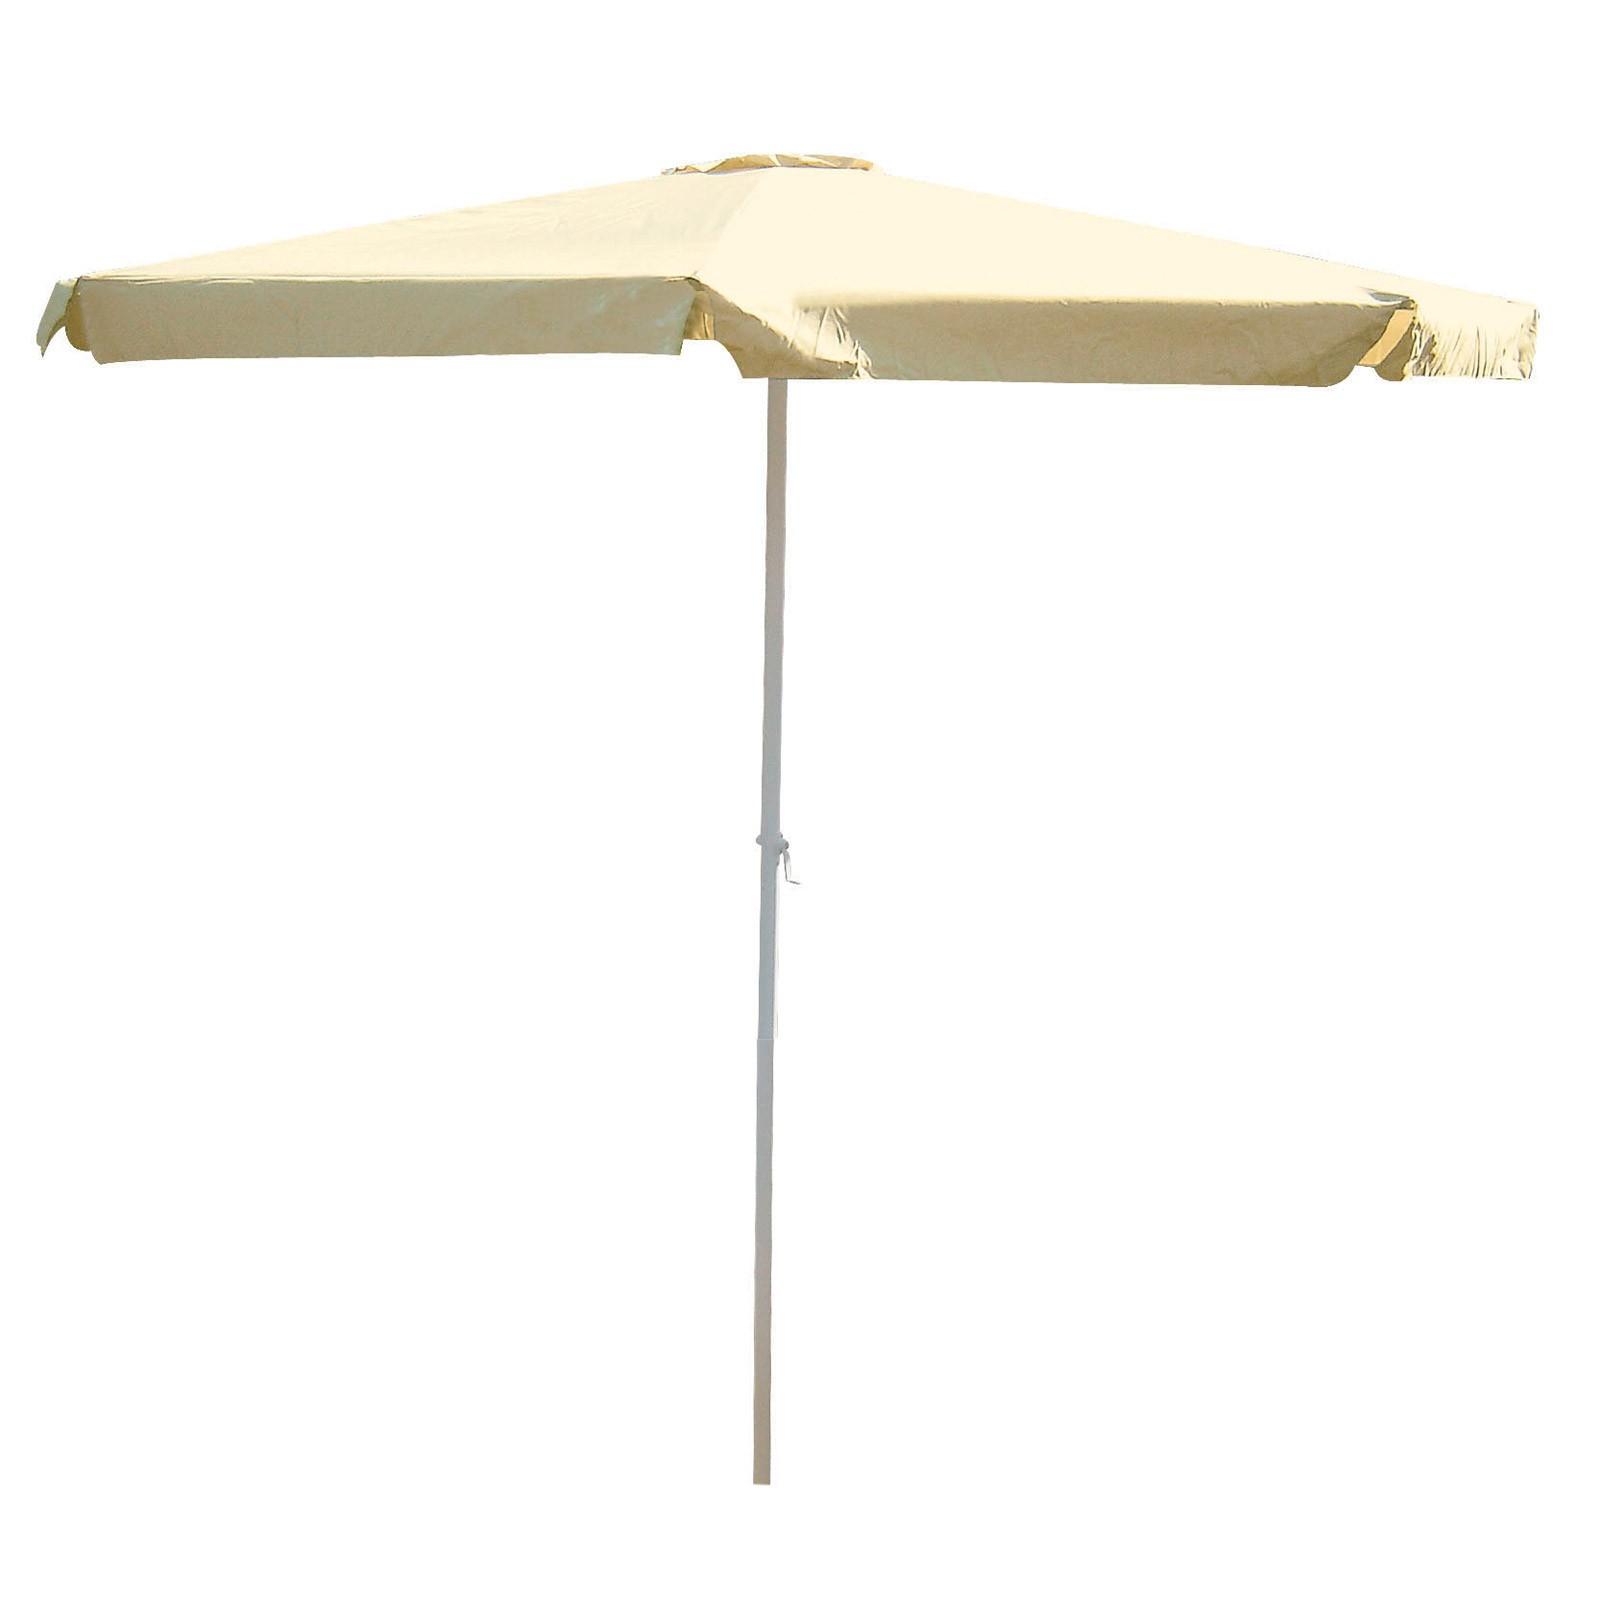 alu kurbel marktschirm sonnenschirm 350 cm terracotta blau beige ebay. Black Bedroom Furniture Sets. Home Design Ideas